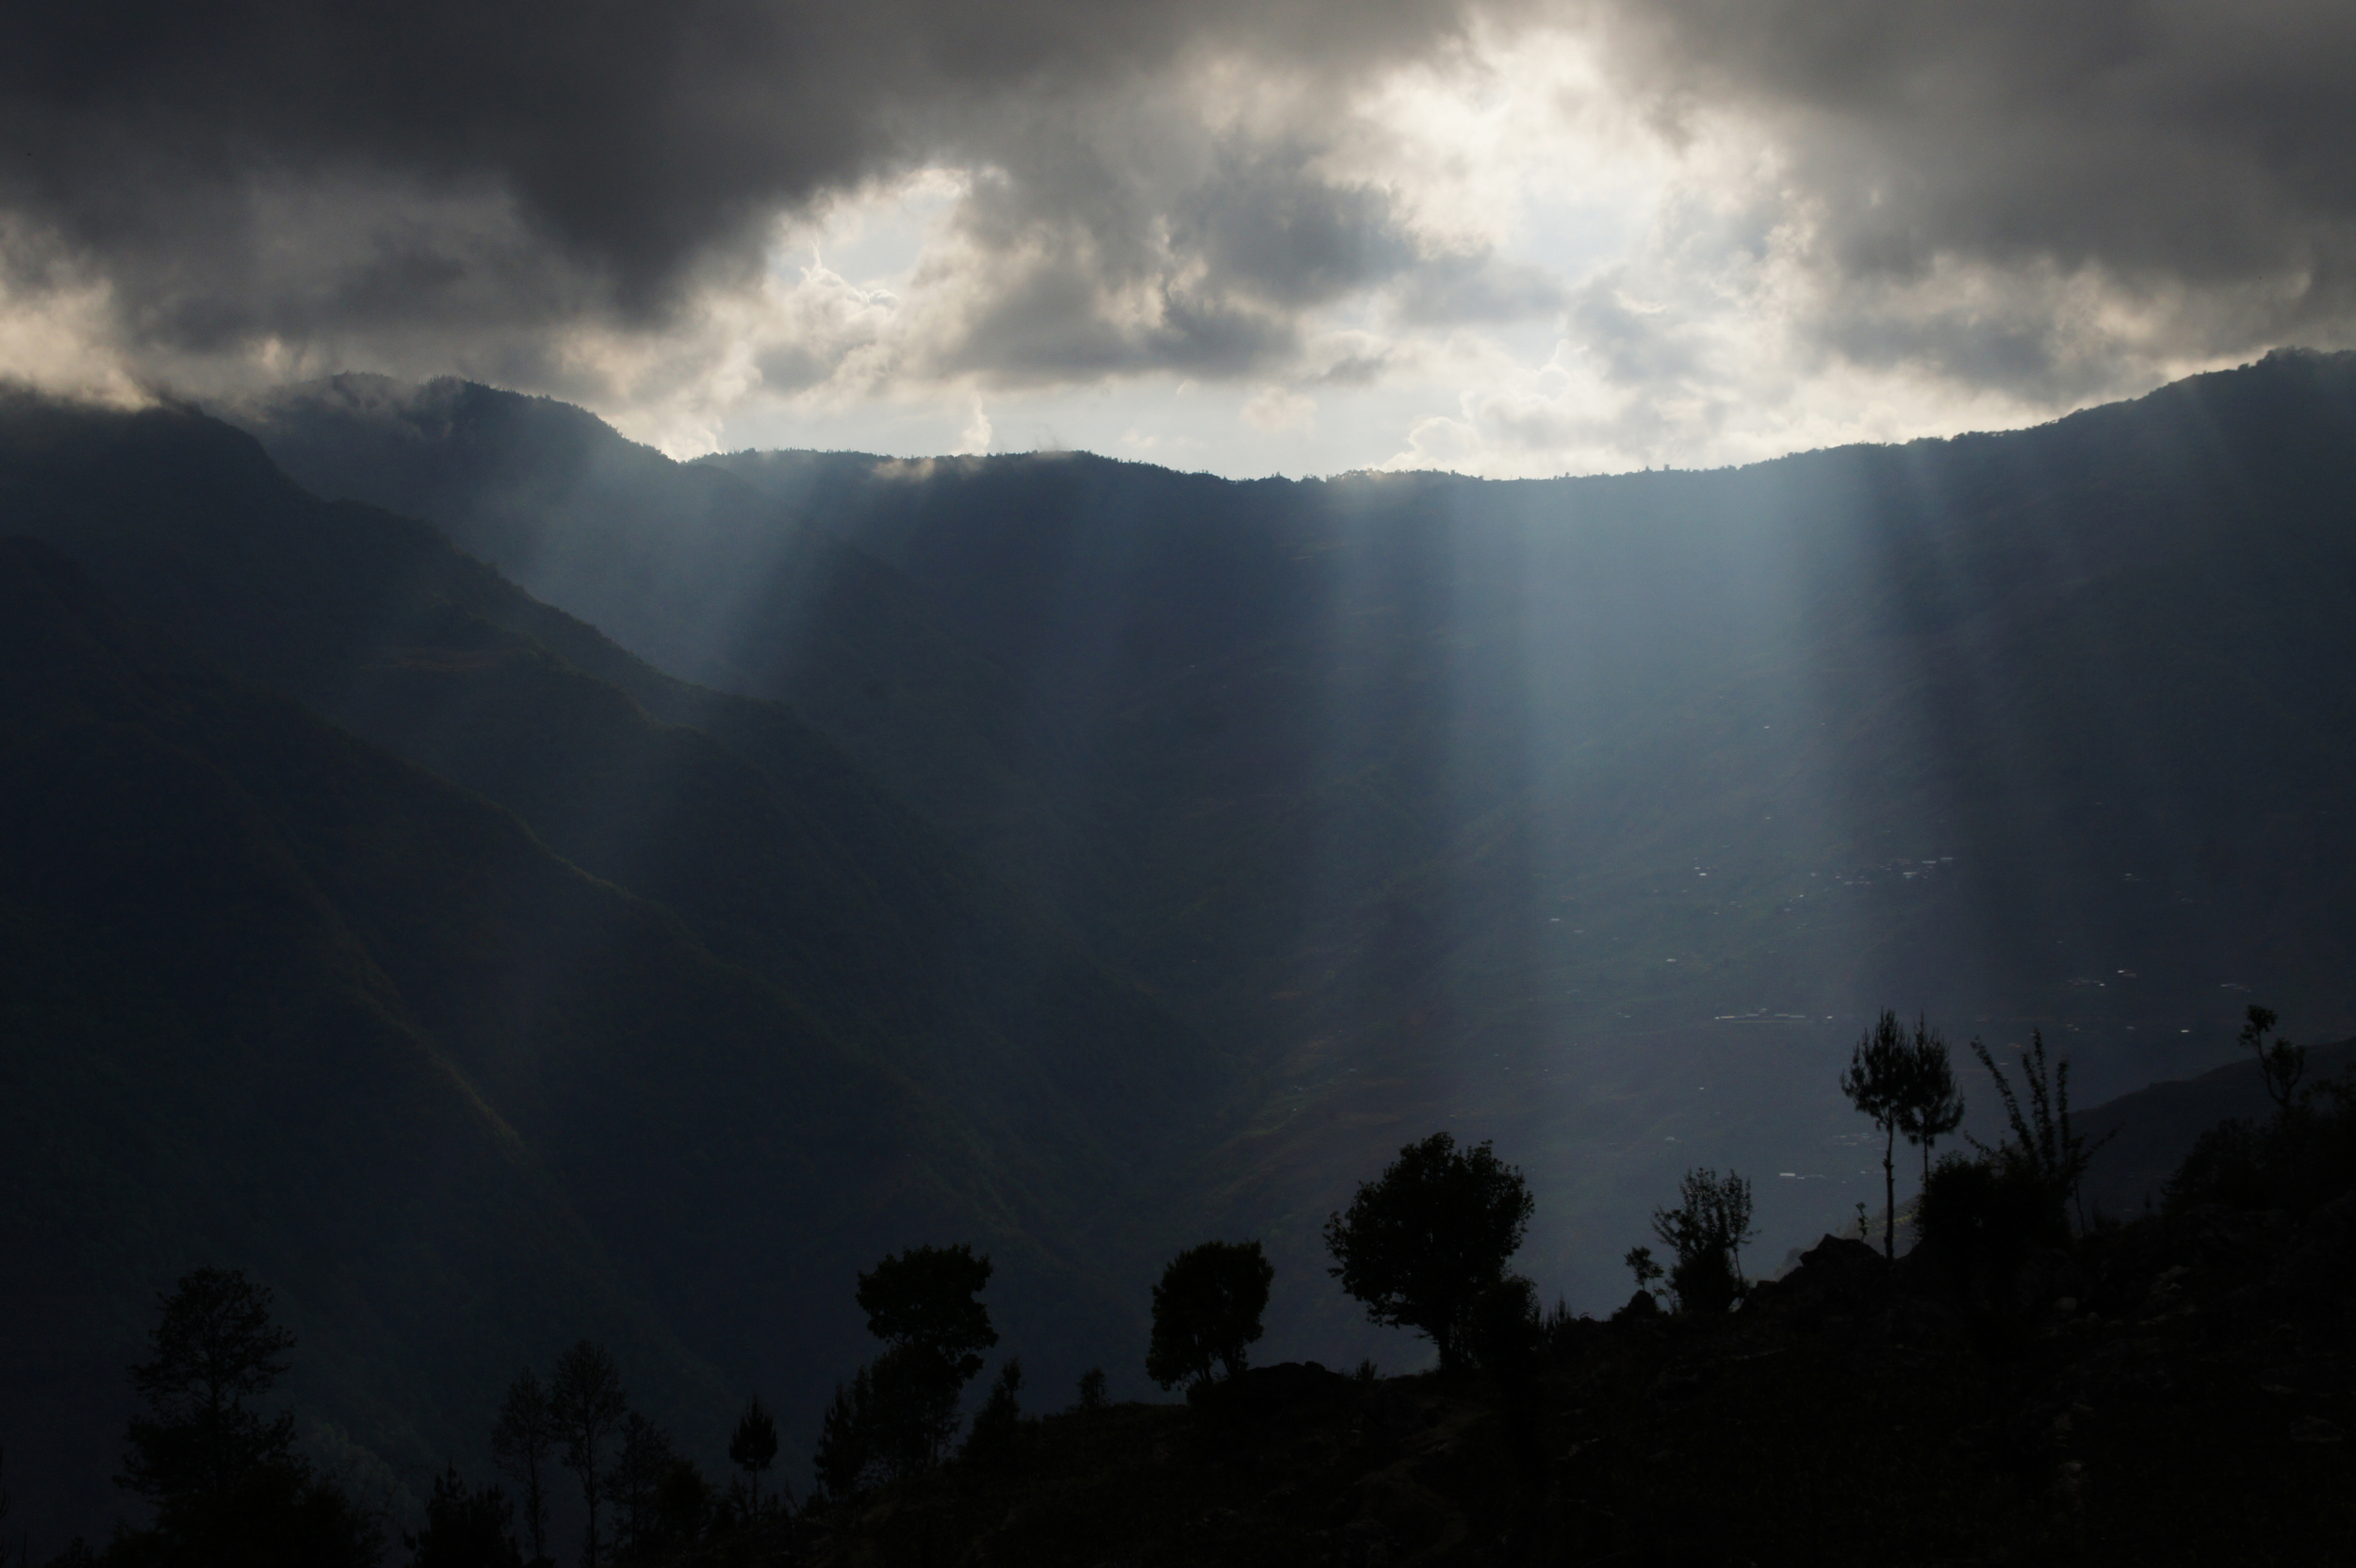 DSC03126_Nepal Mountains sun breaking through-1.jpg